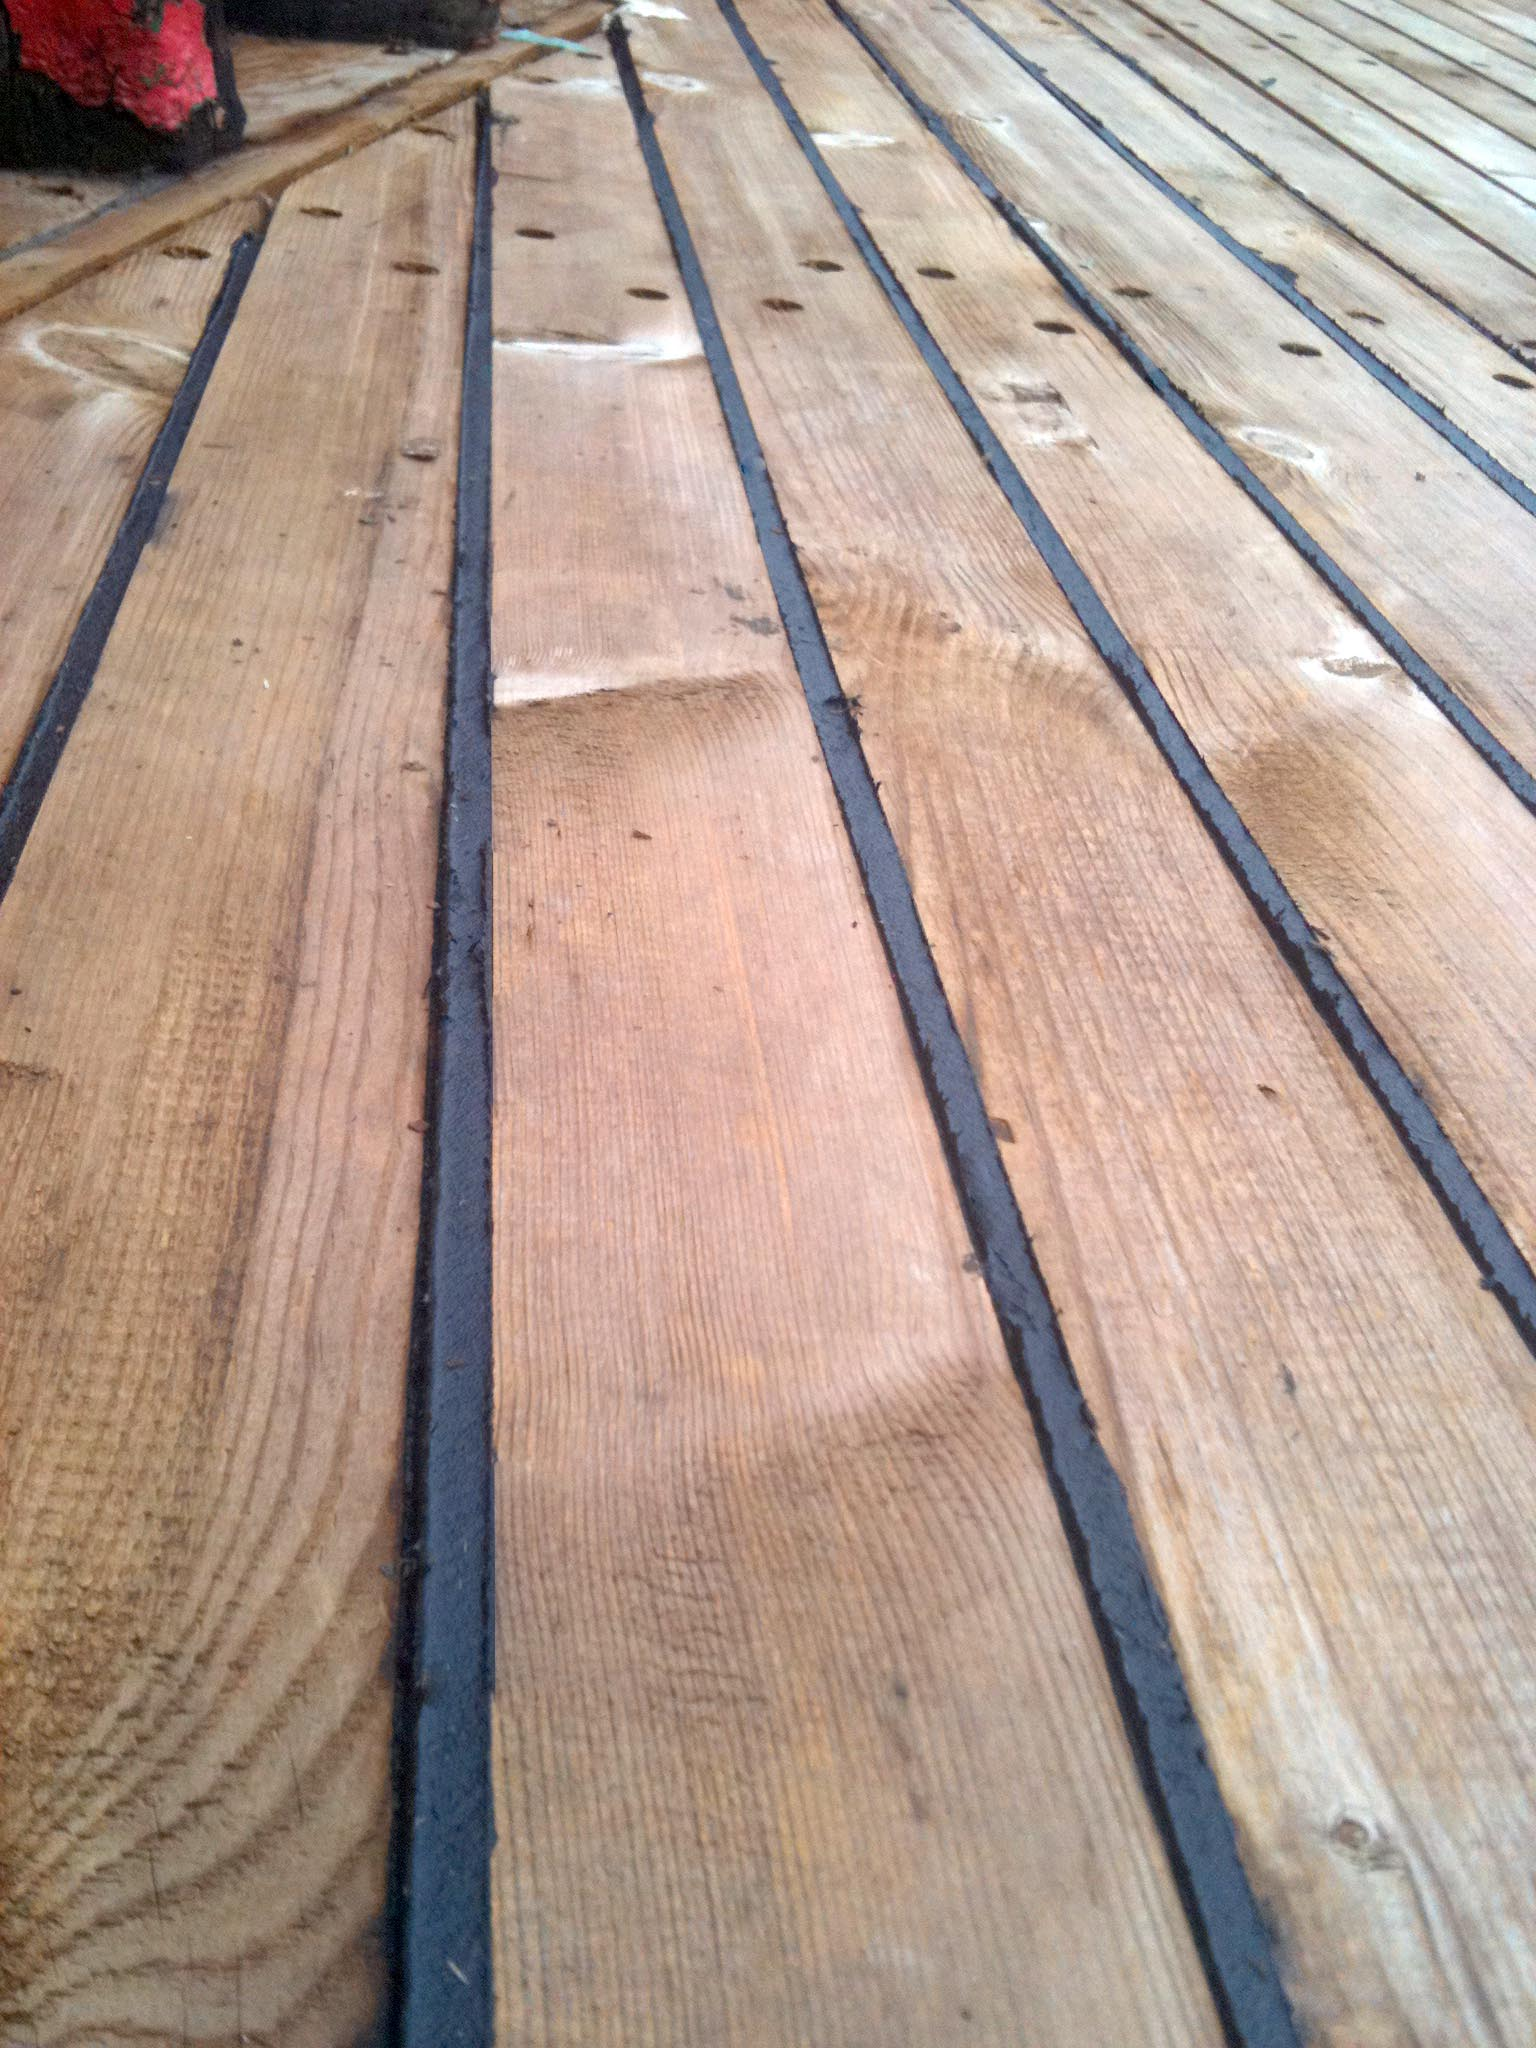 More deck caulking hull caulking and seam paying caulking a wooden deck and sealing deck seams on a wooden boat baanklon Gallery